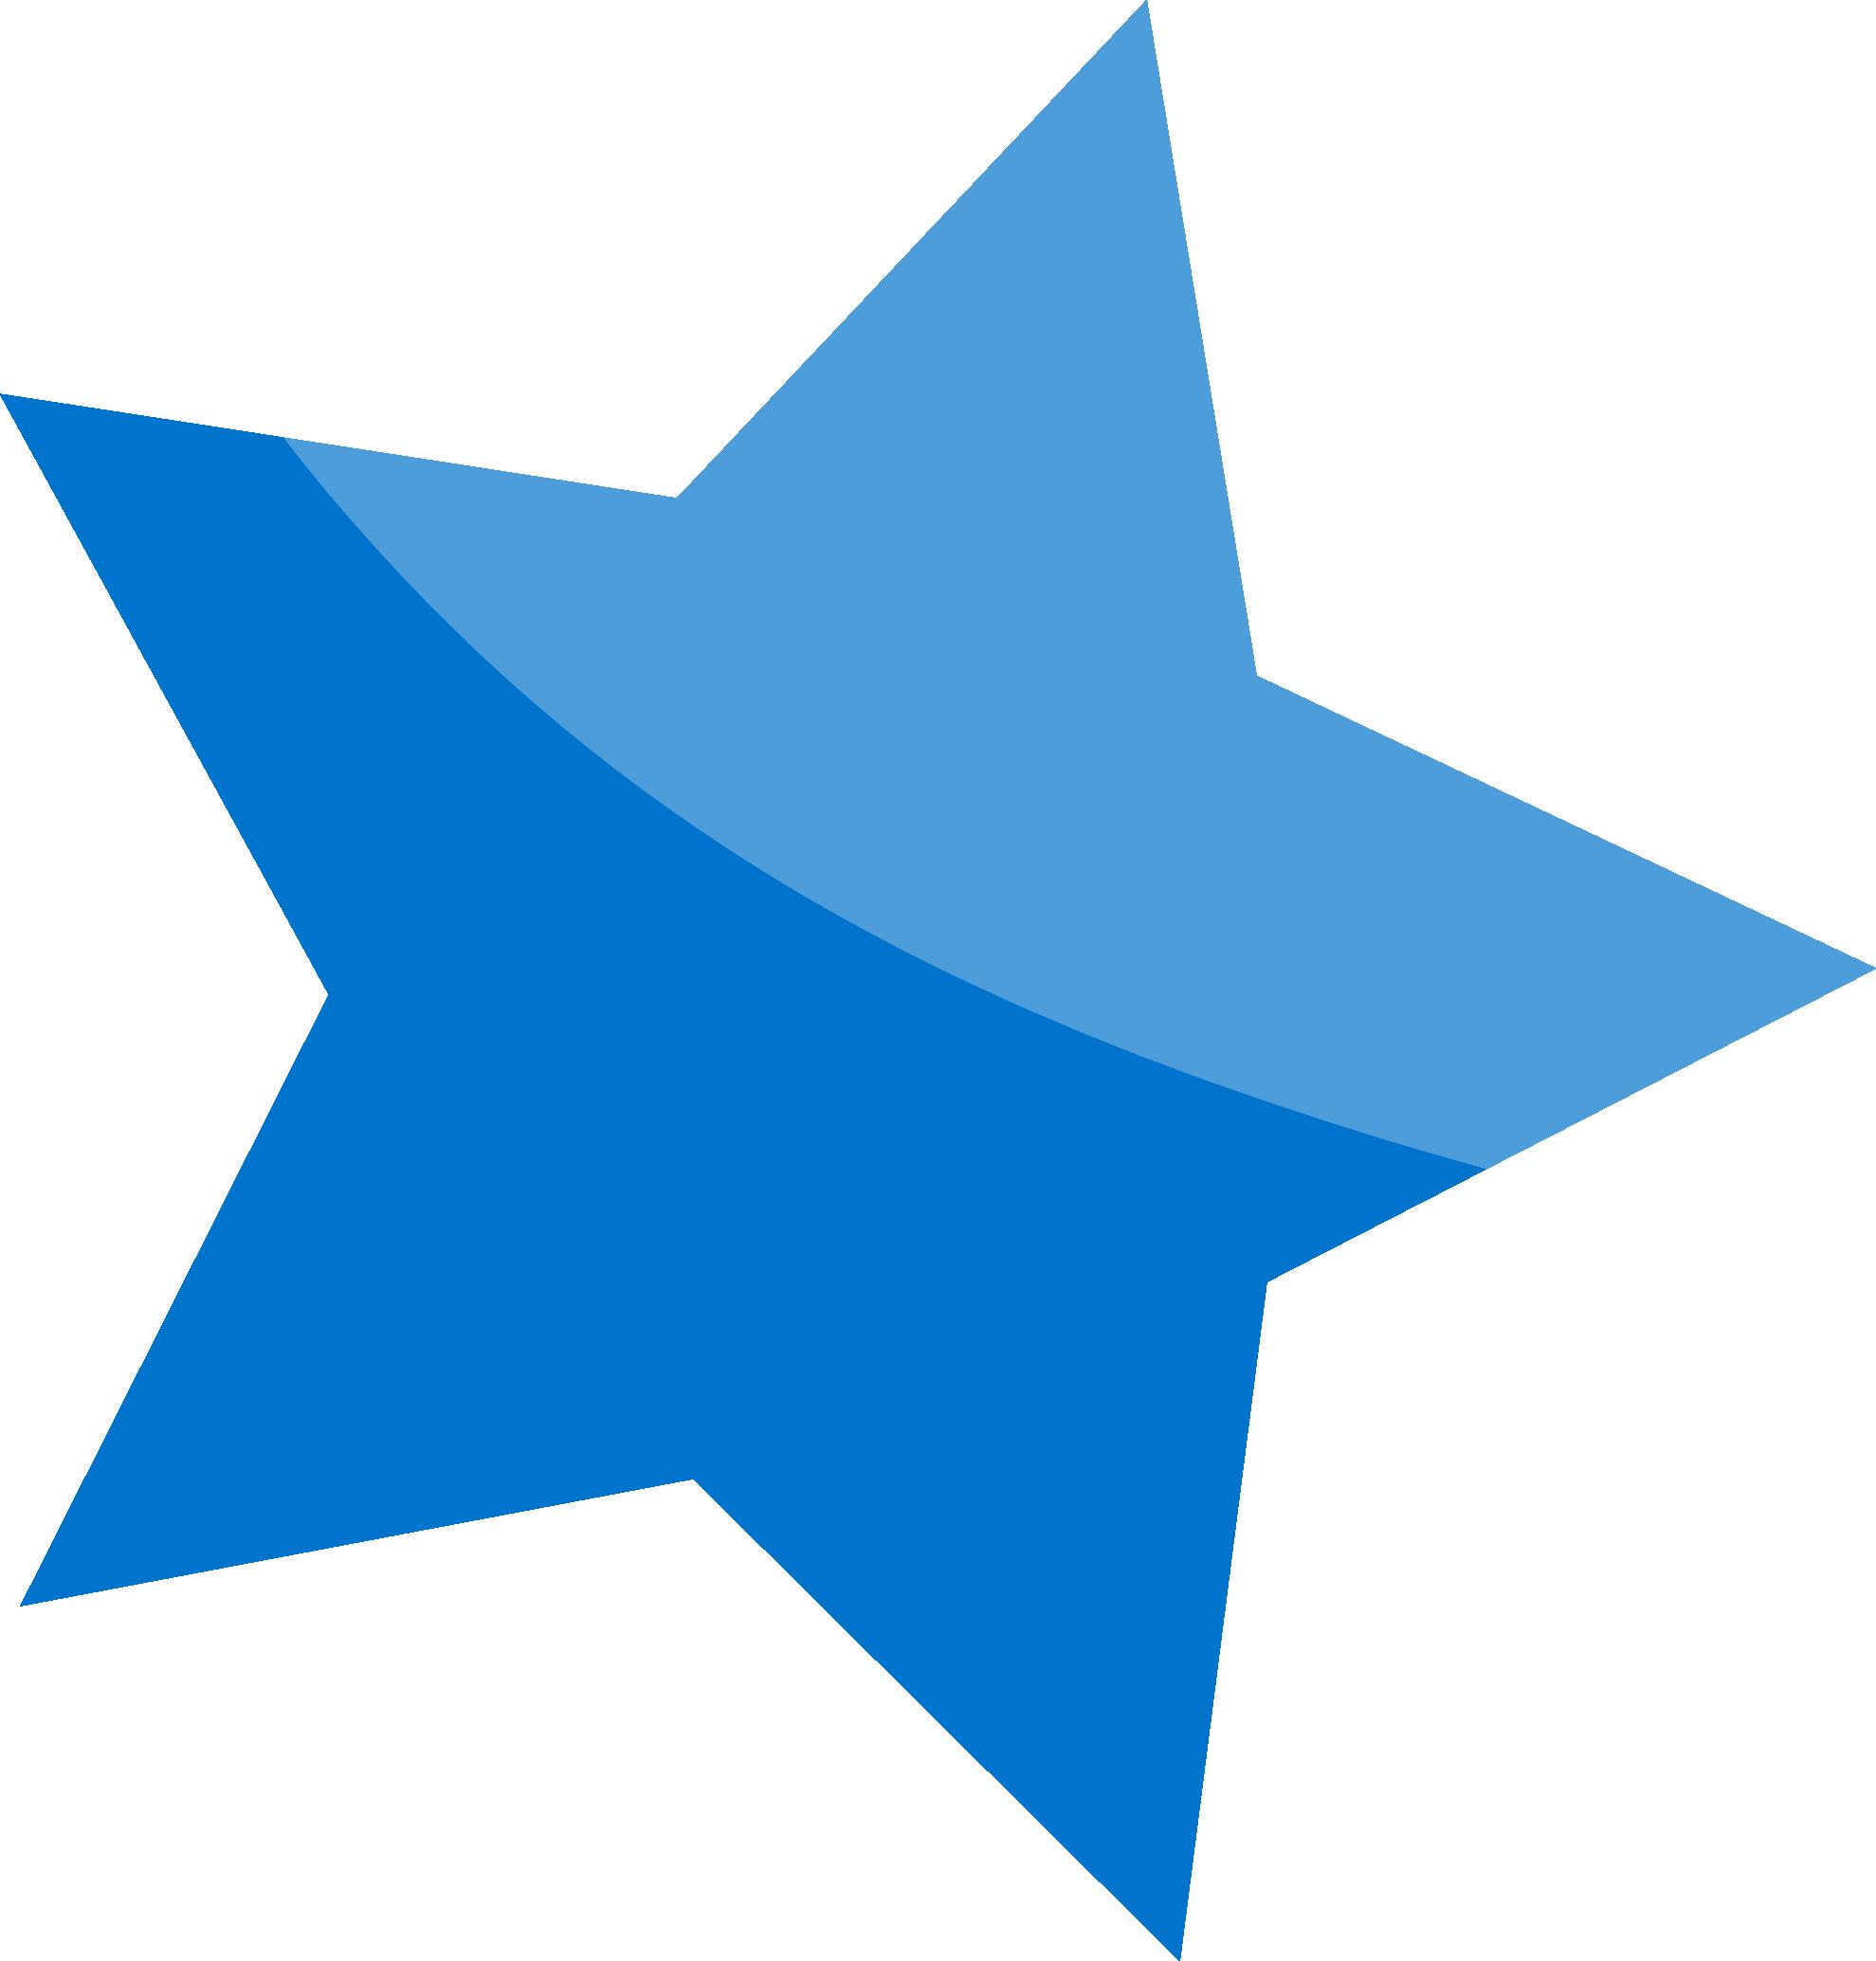 Star clip art transparent background. Blue png image free